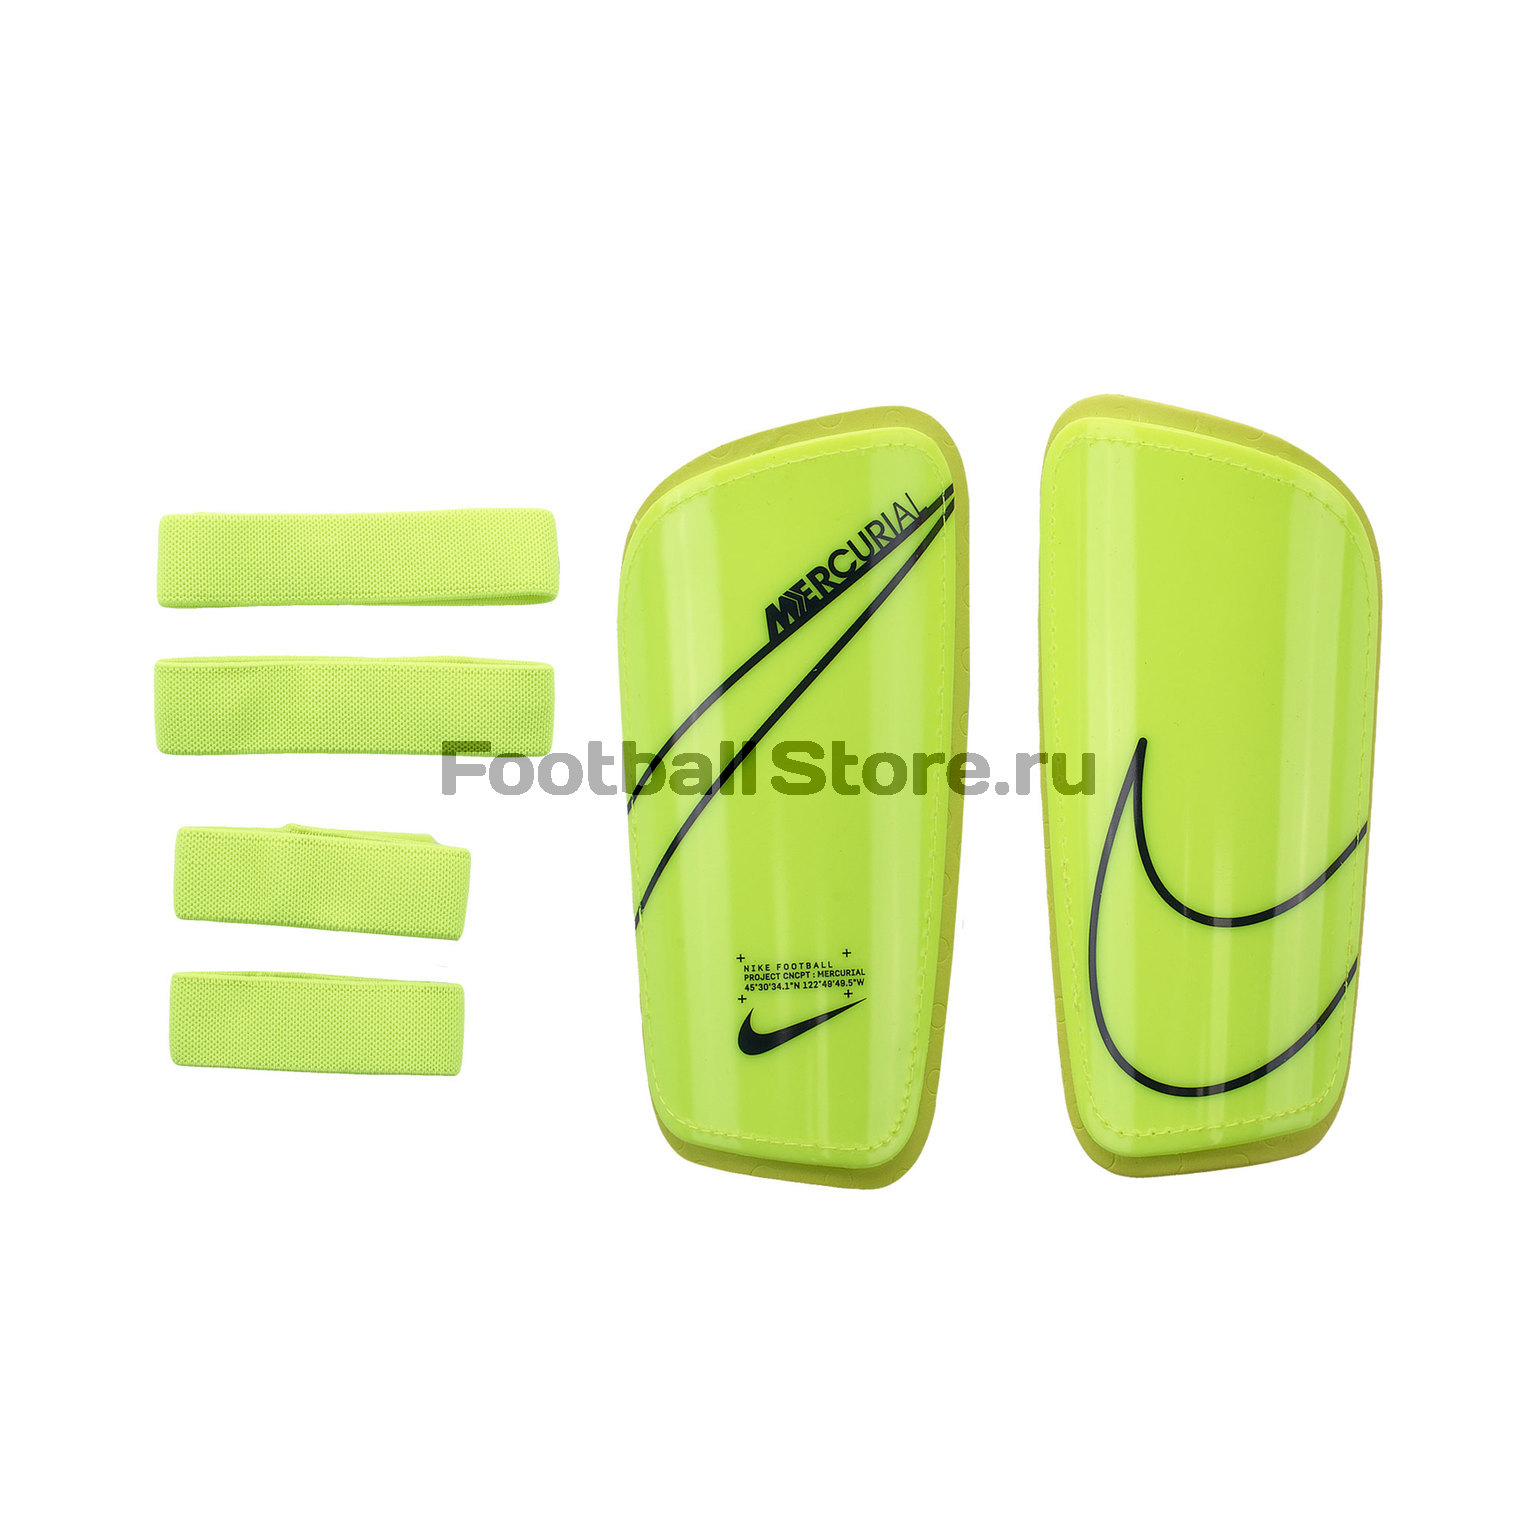 Щитки Nike Mercurial Hardshell SP2128-703